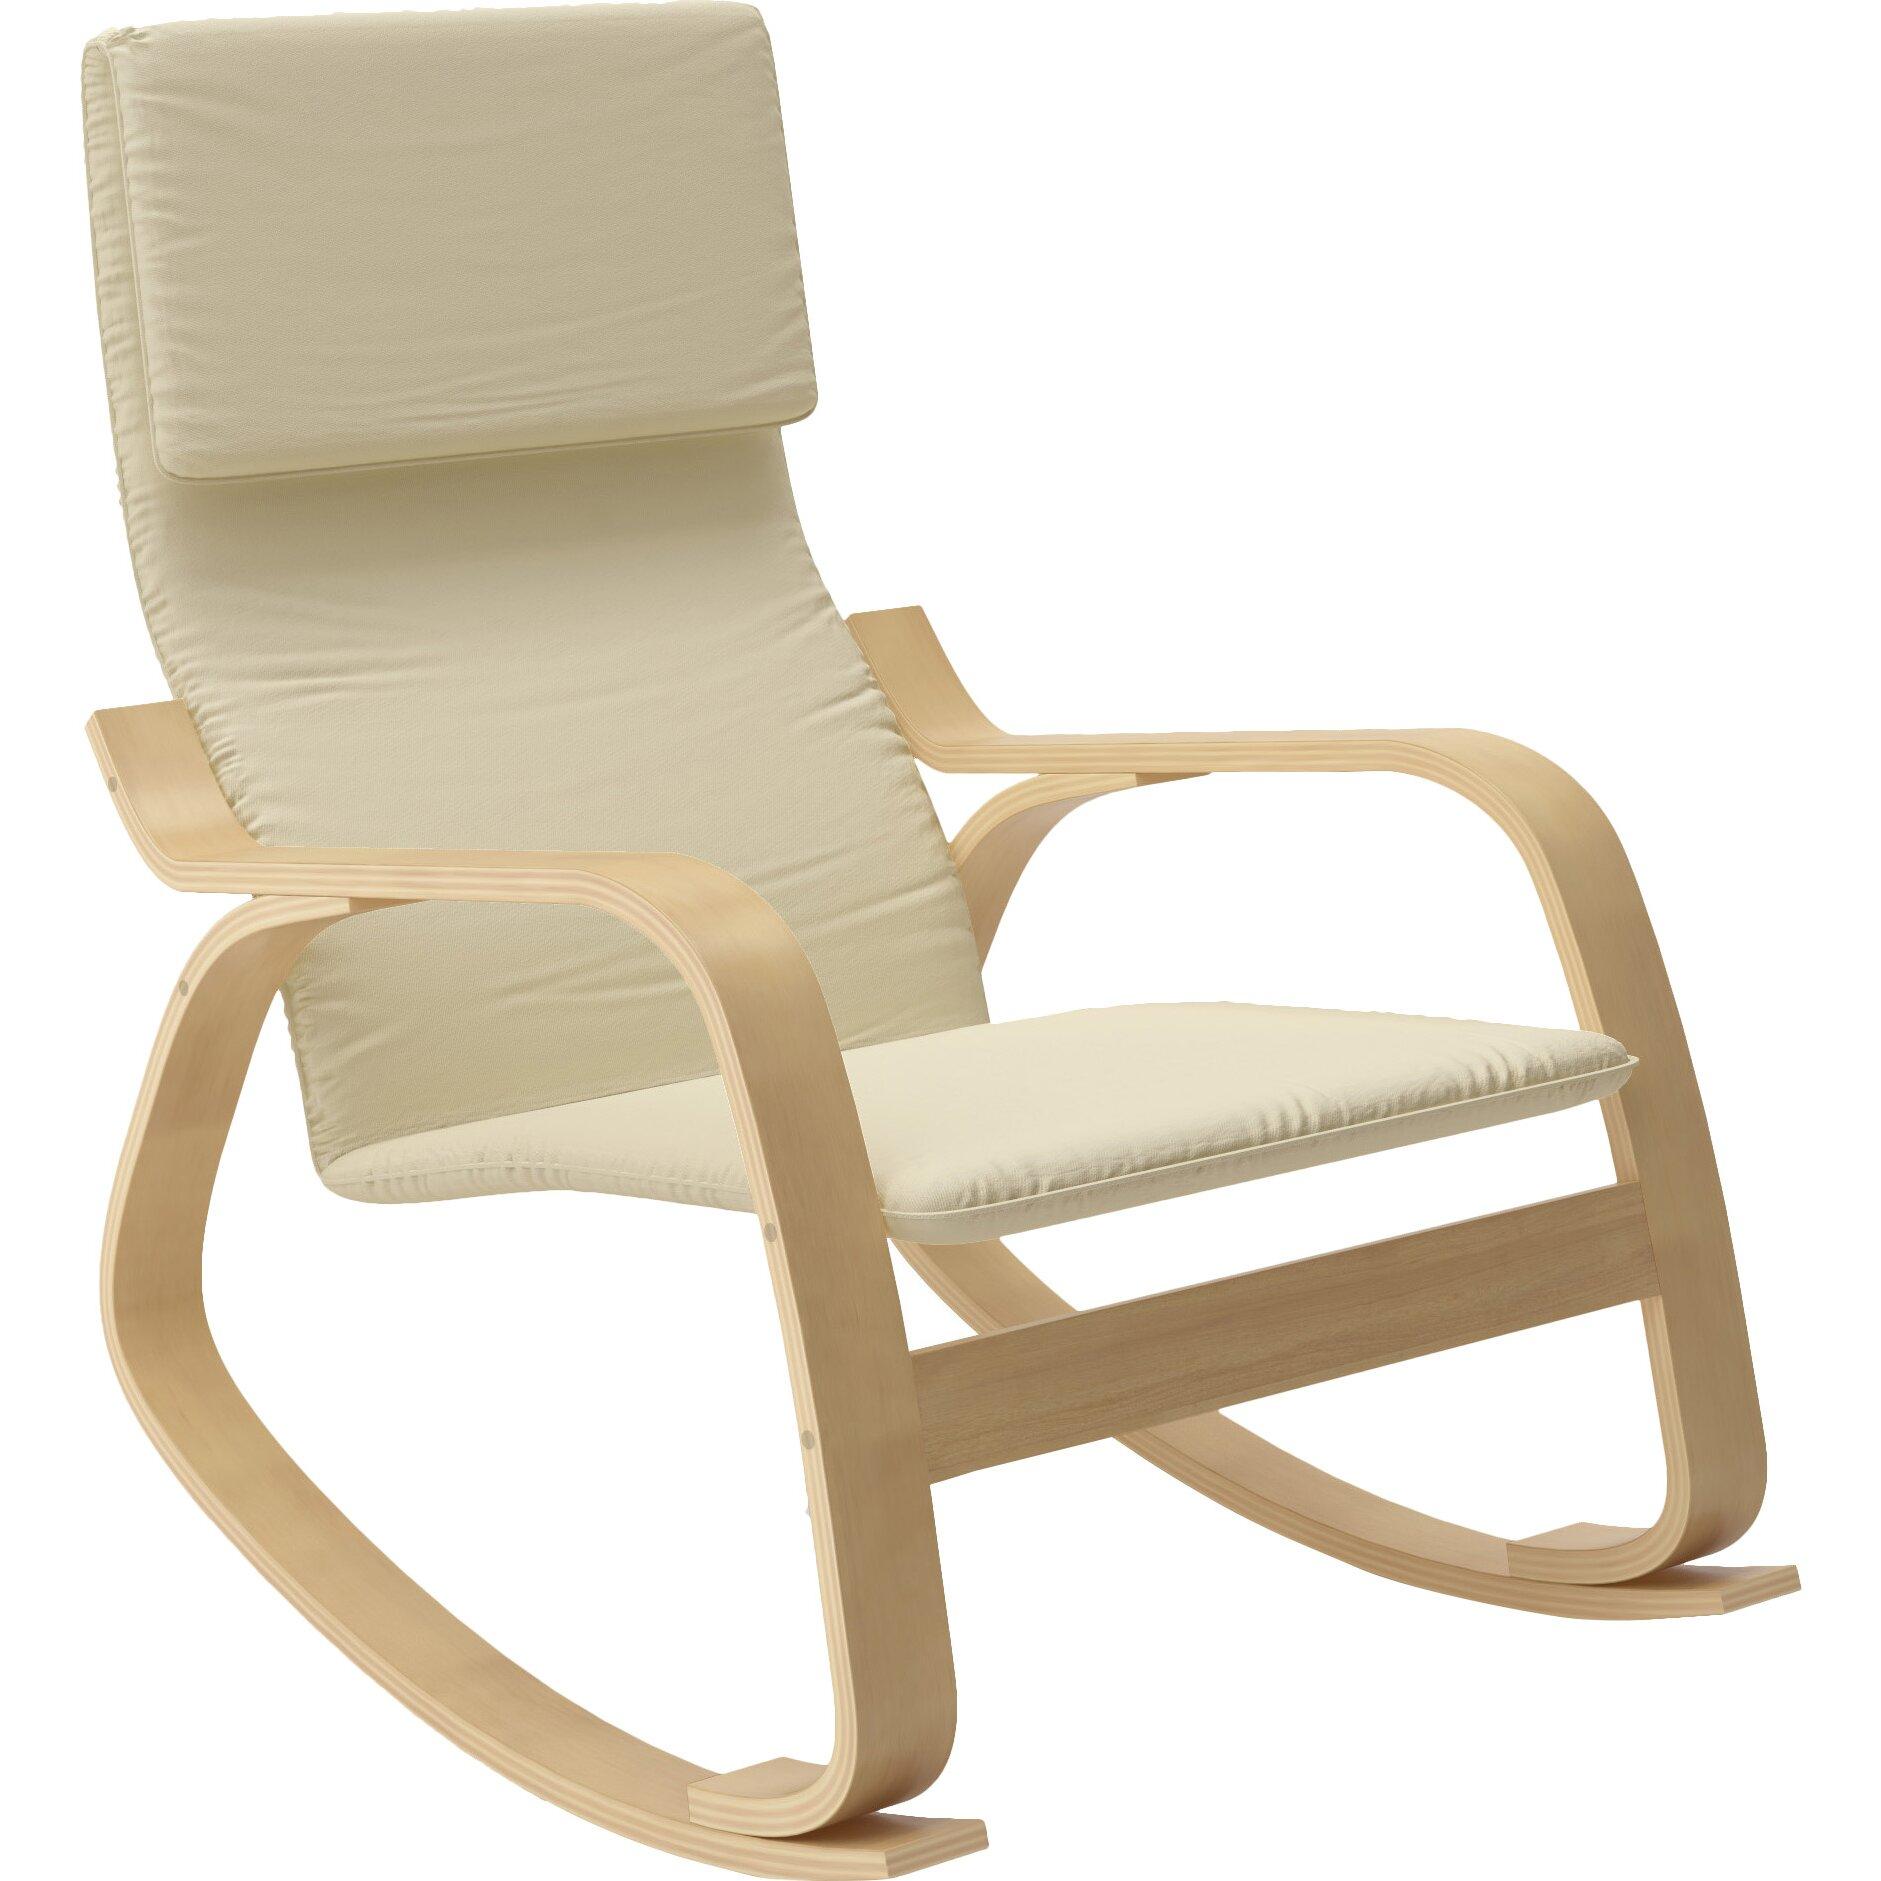 ... Furniture ... Manufactured Wood Rocking Chairs dCOR design SKU